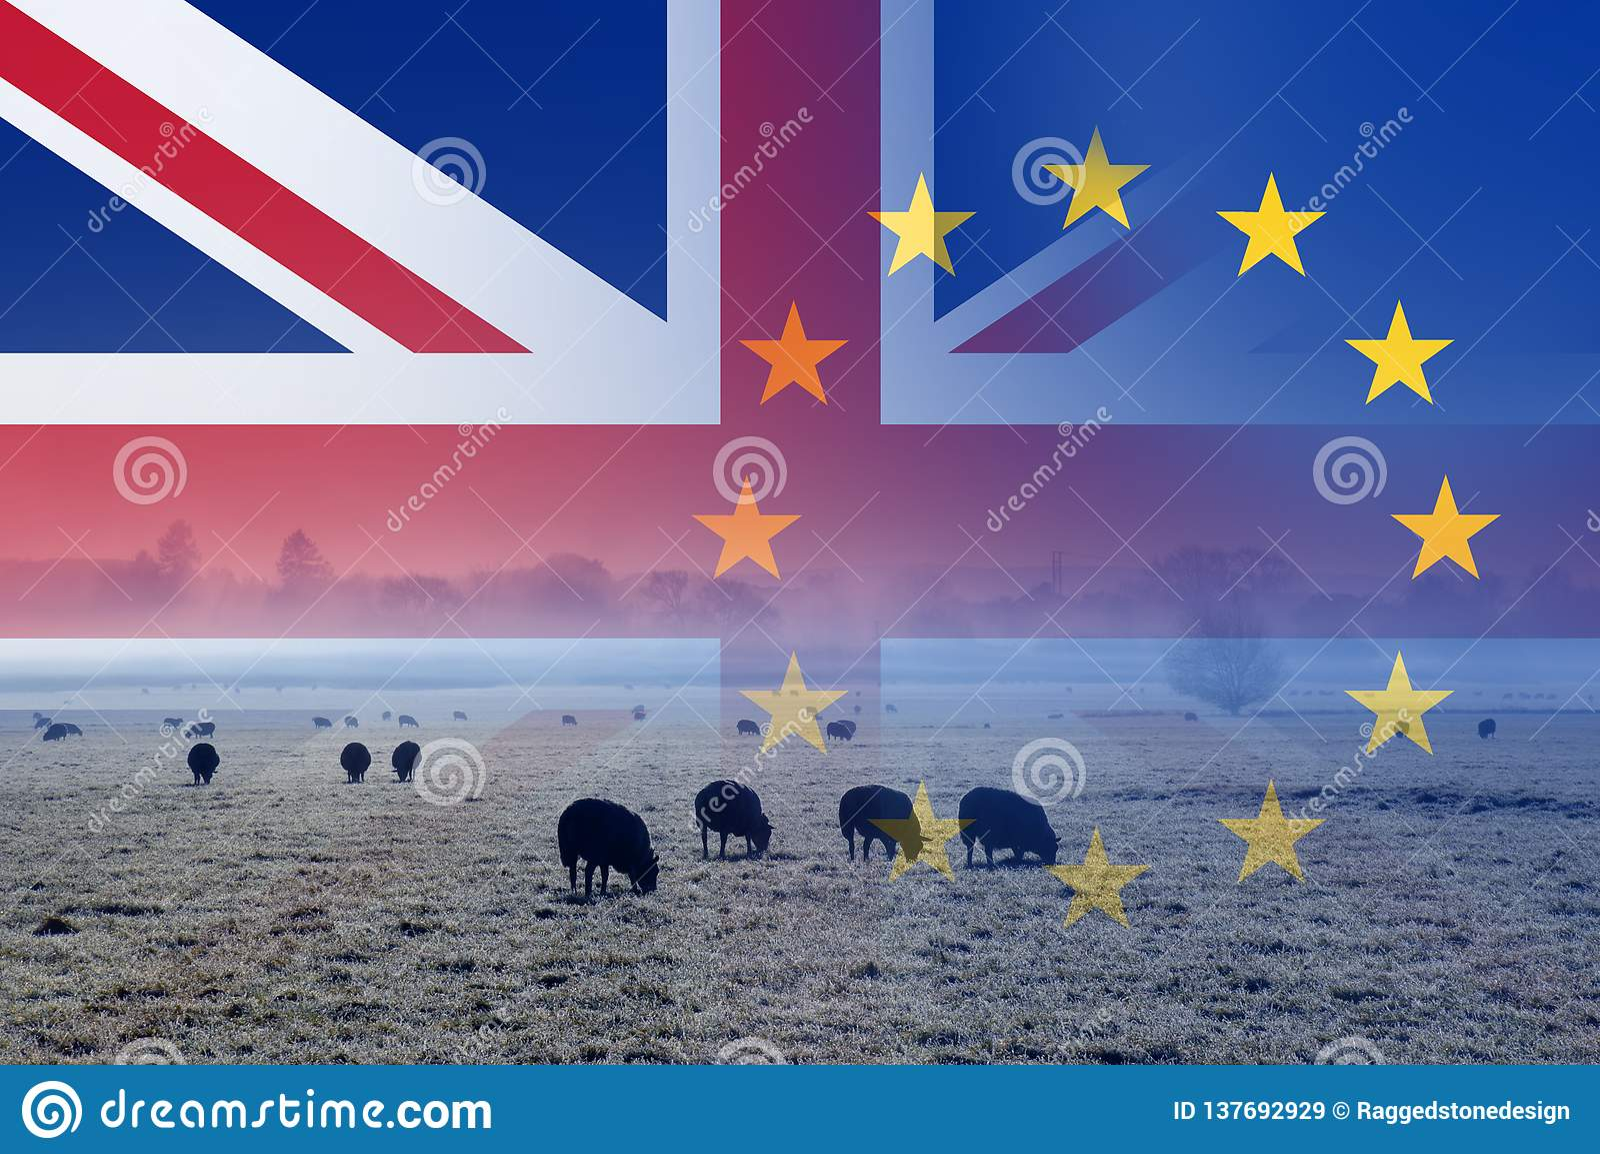 Brexit概念、英国乡下有绵羊的在一个领域与英国国旗和E 在上面分层堆积的U旗子